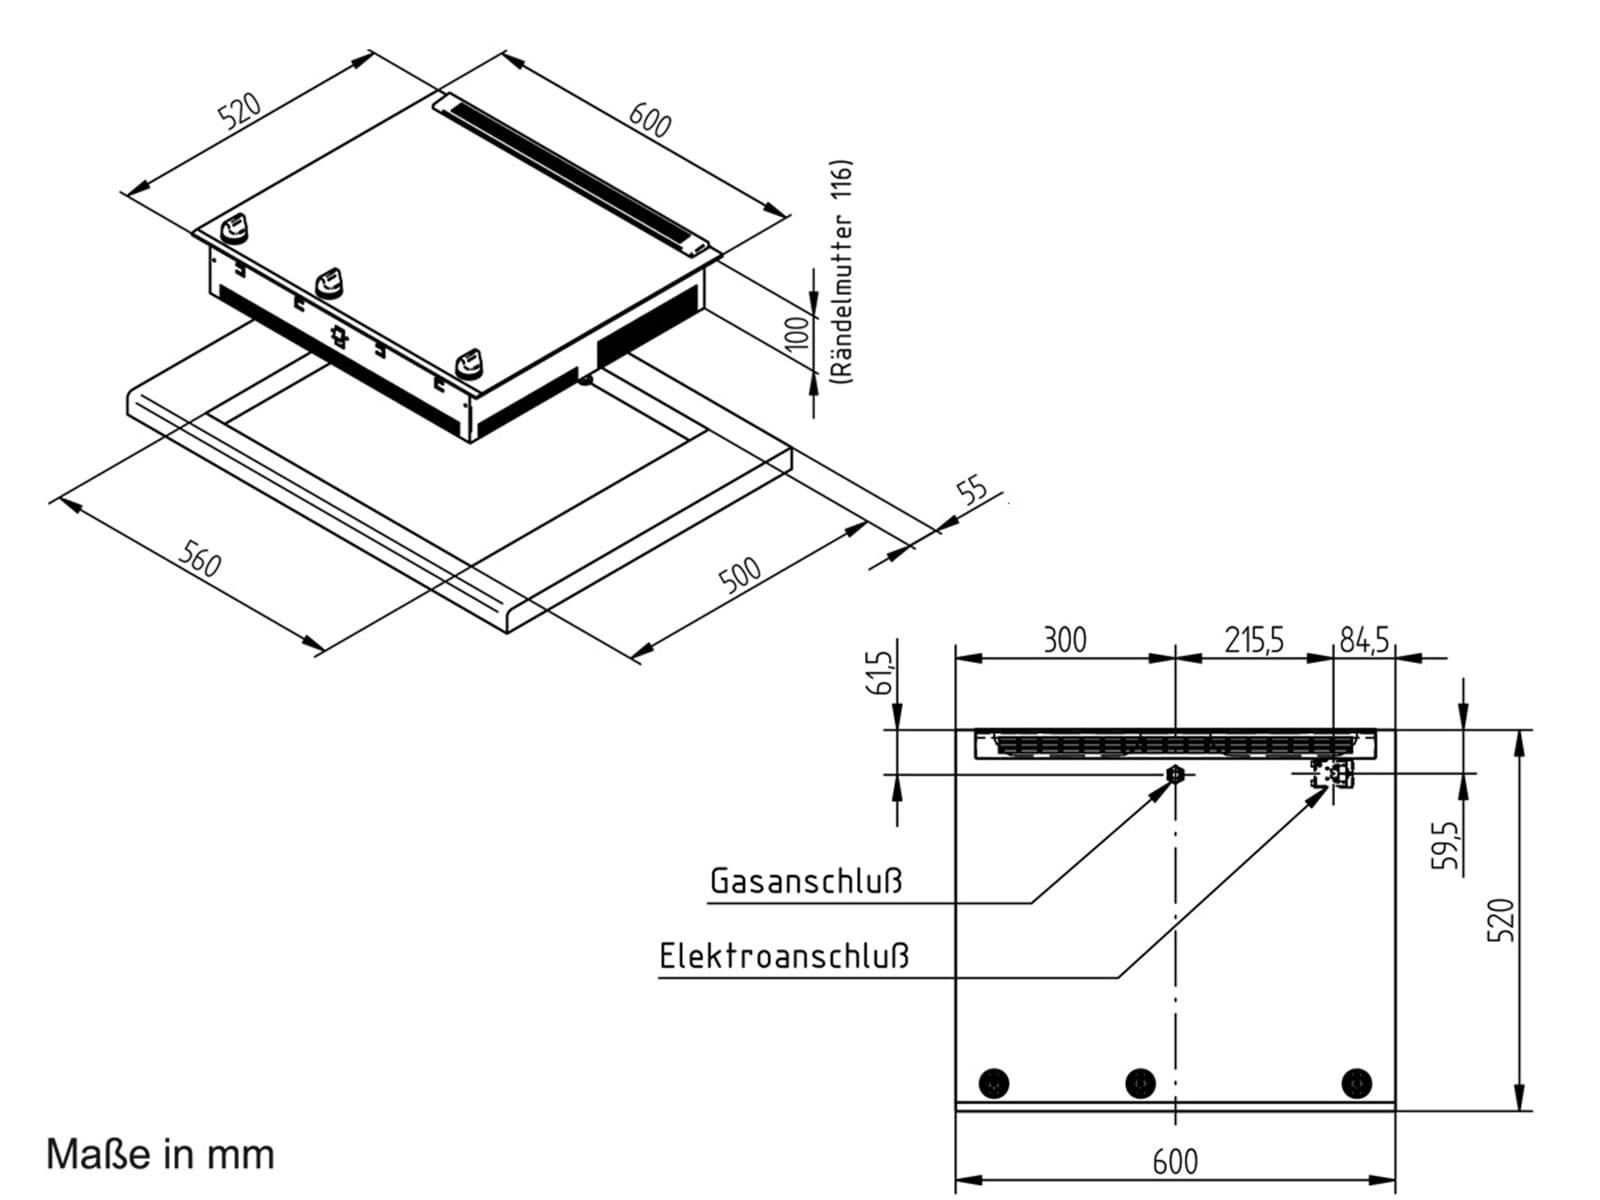 oranier ekg 2736 2736 18 glaskeramik gas kochstelle autark kochfeld einbau ebay. Black Bedroom Furniture Sets. Home Design Ideas